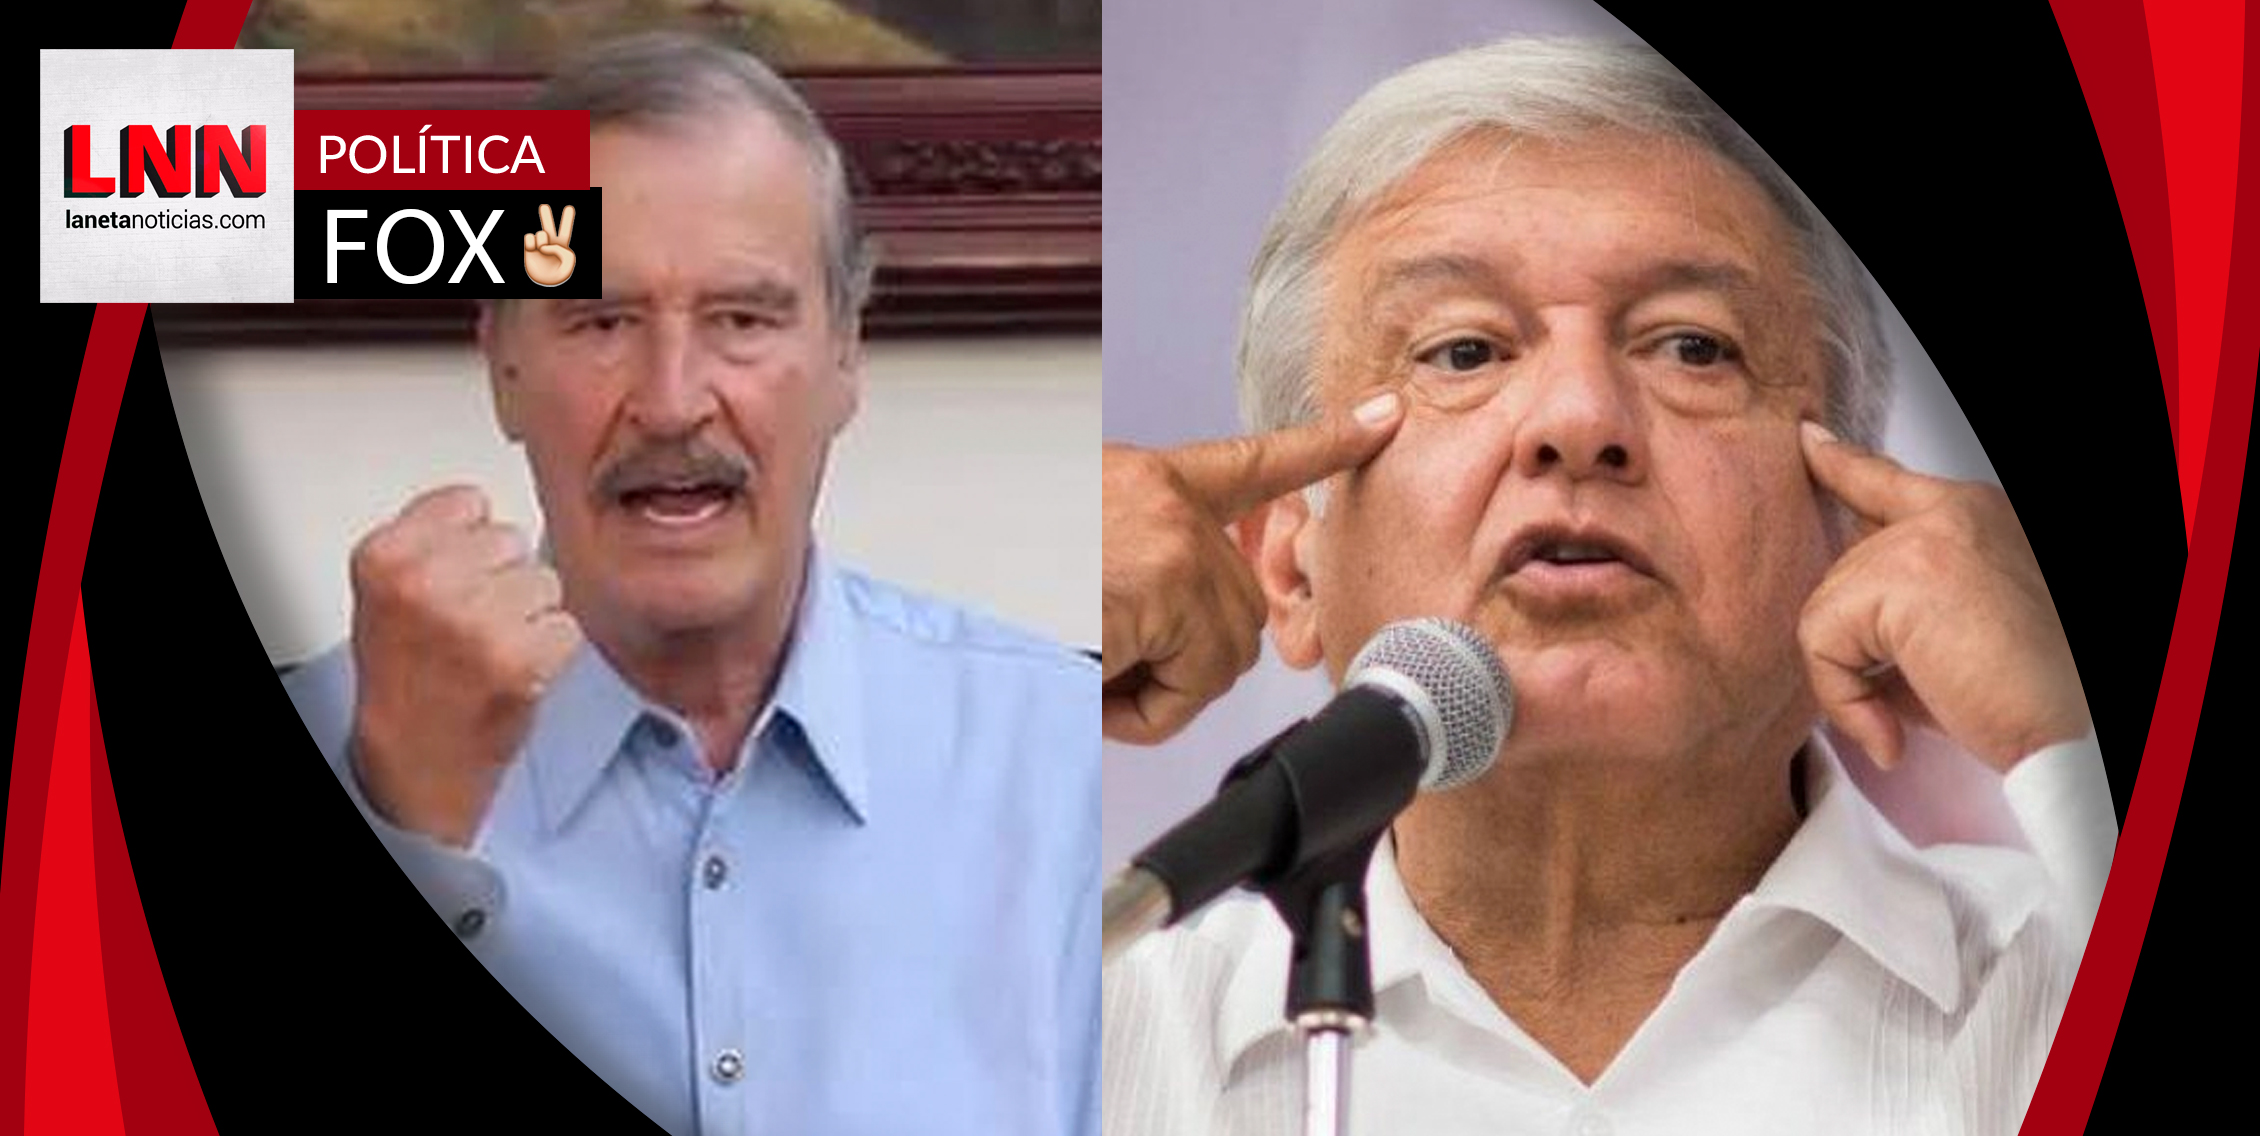 Vicente Fox insulta a AMLO llamándolo 'ulero' por no querer debatir